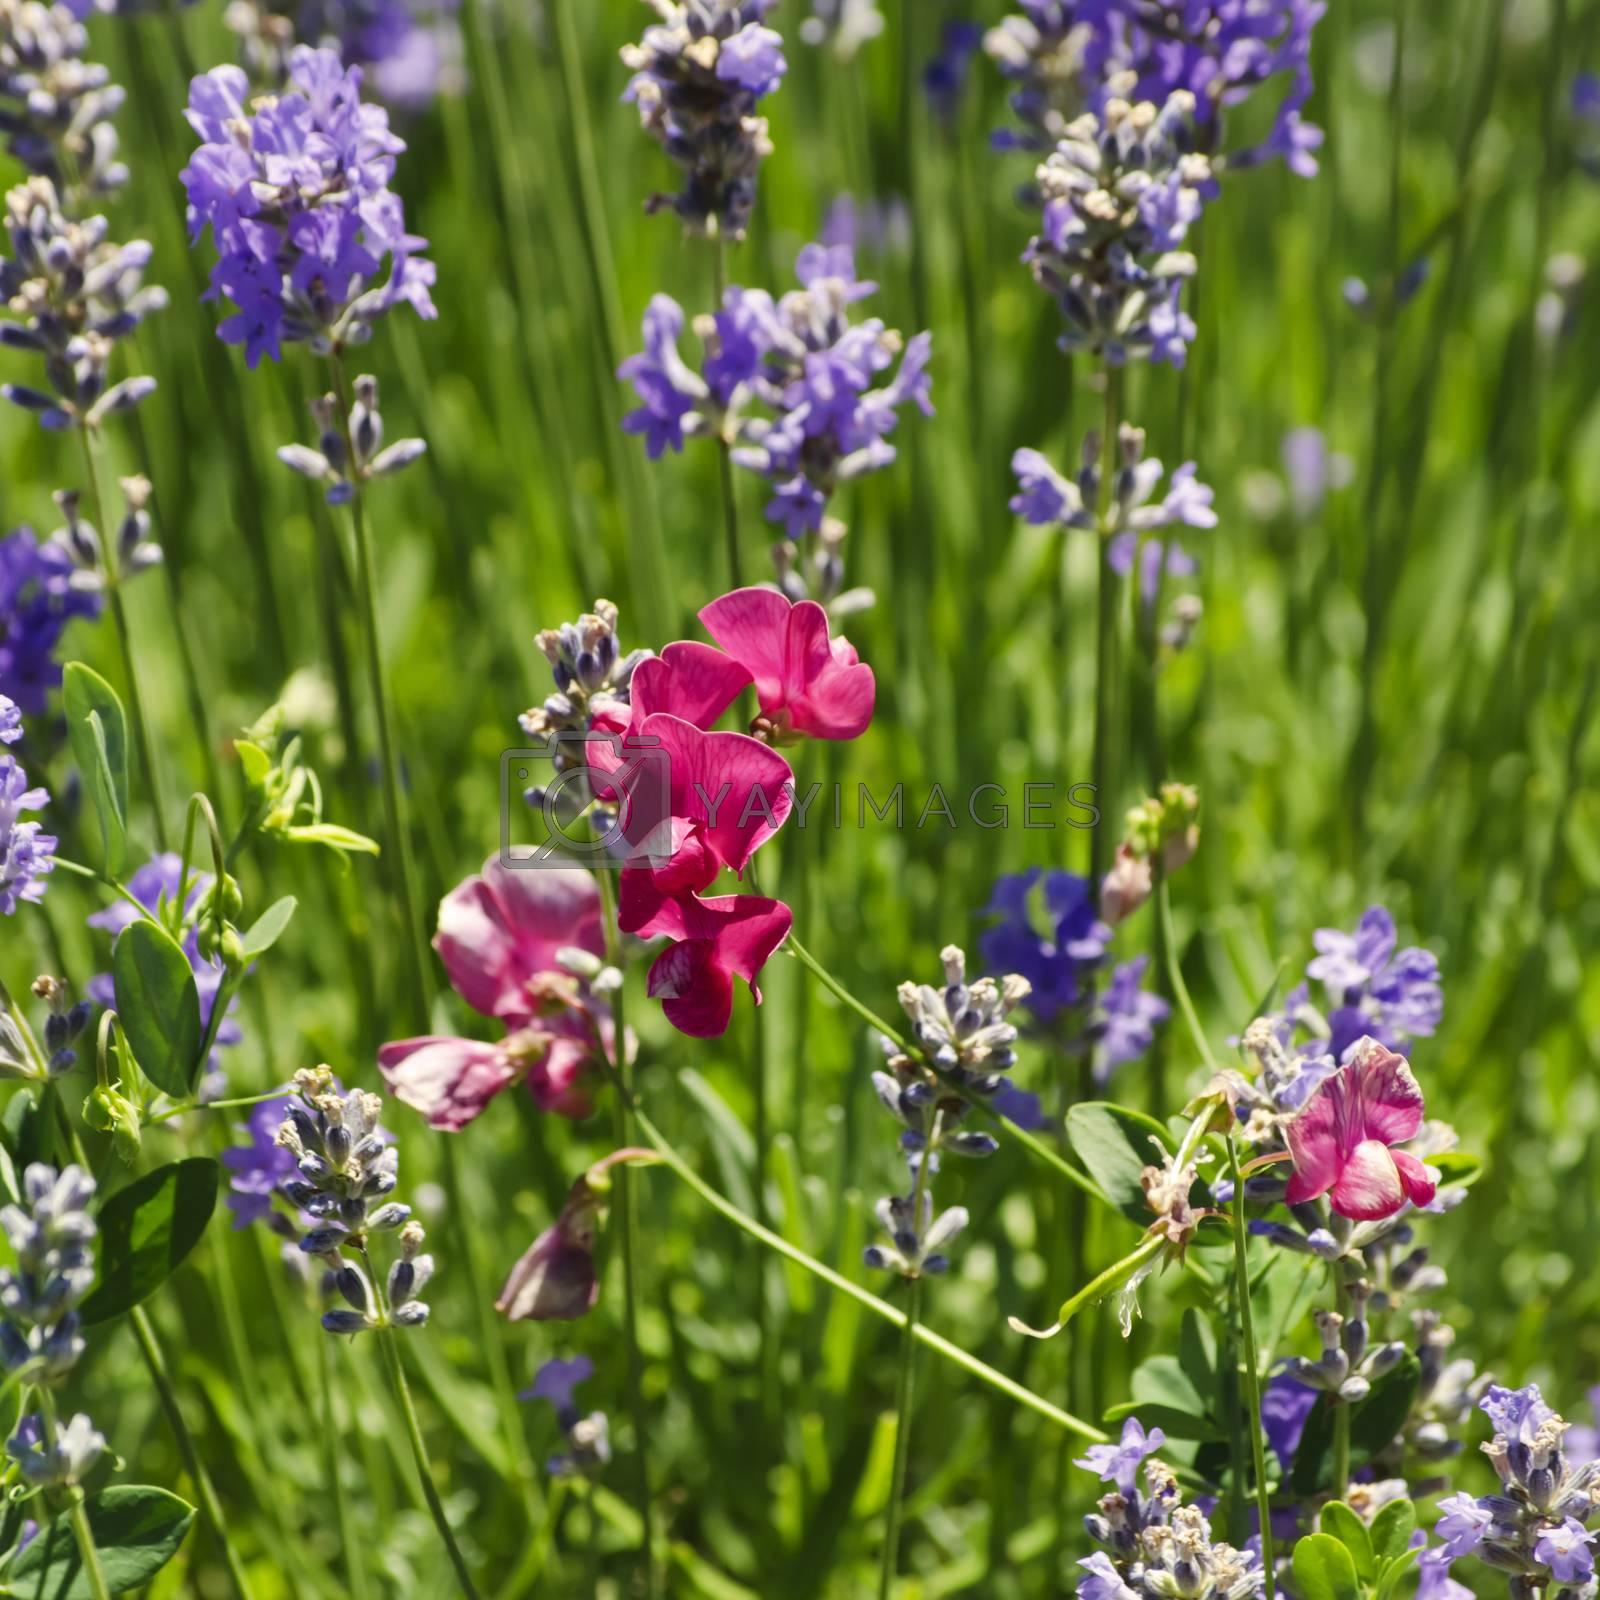 Pink Vetch Flower Over Green Grass Background